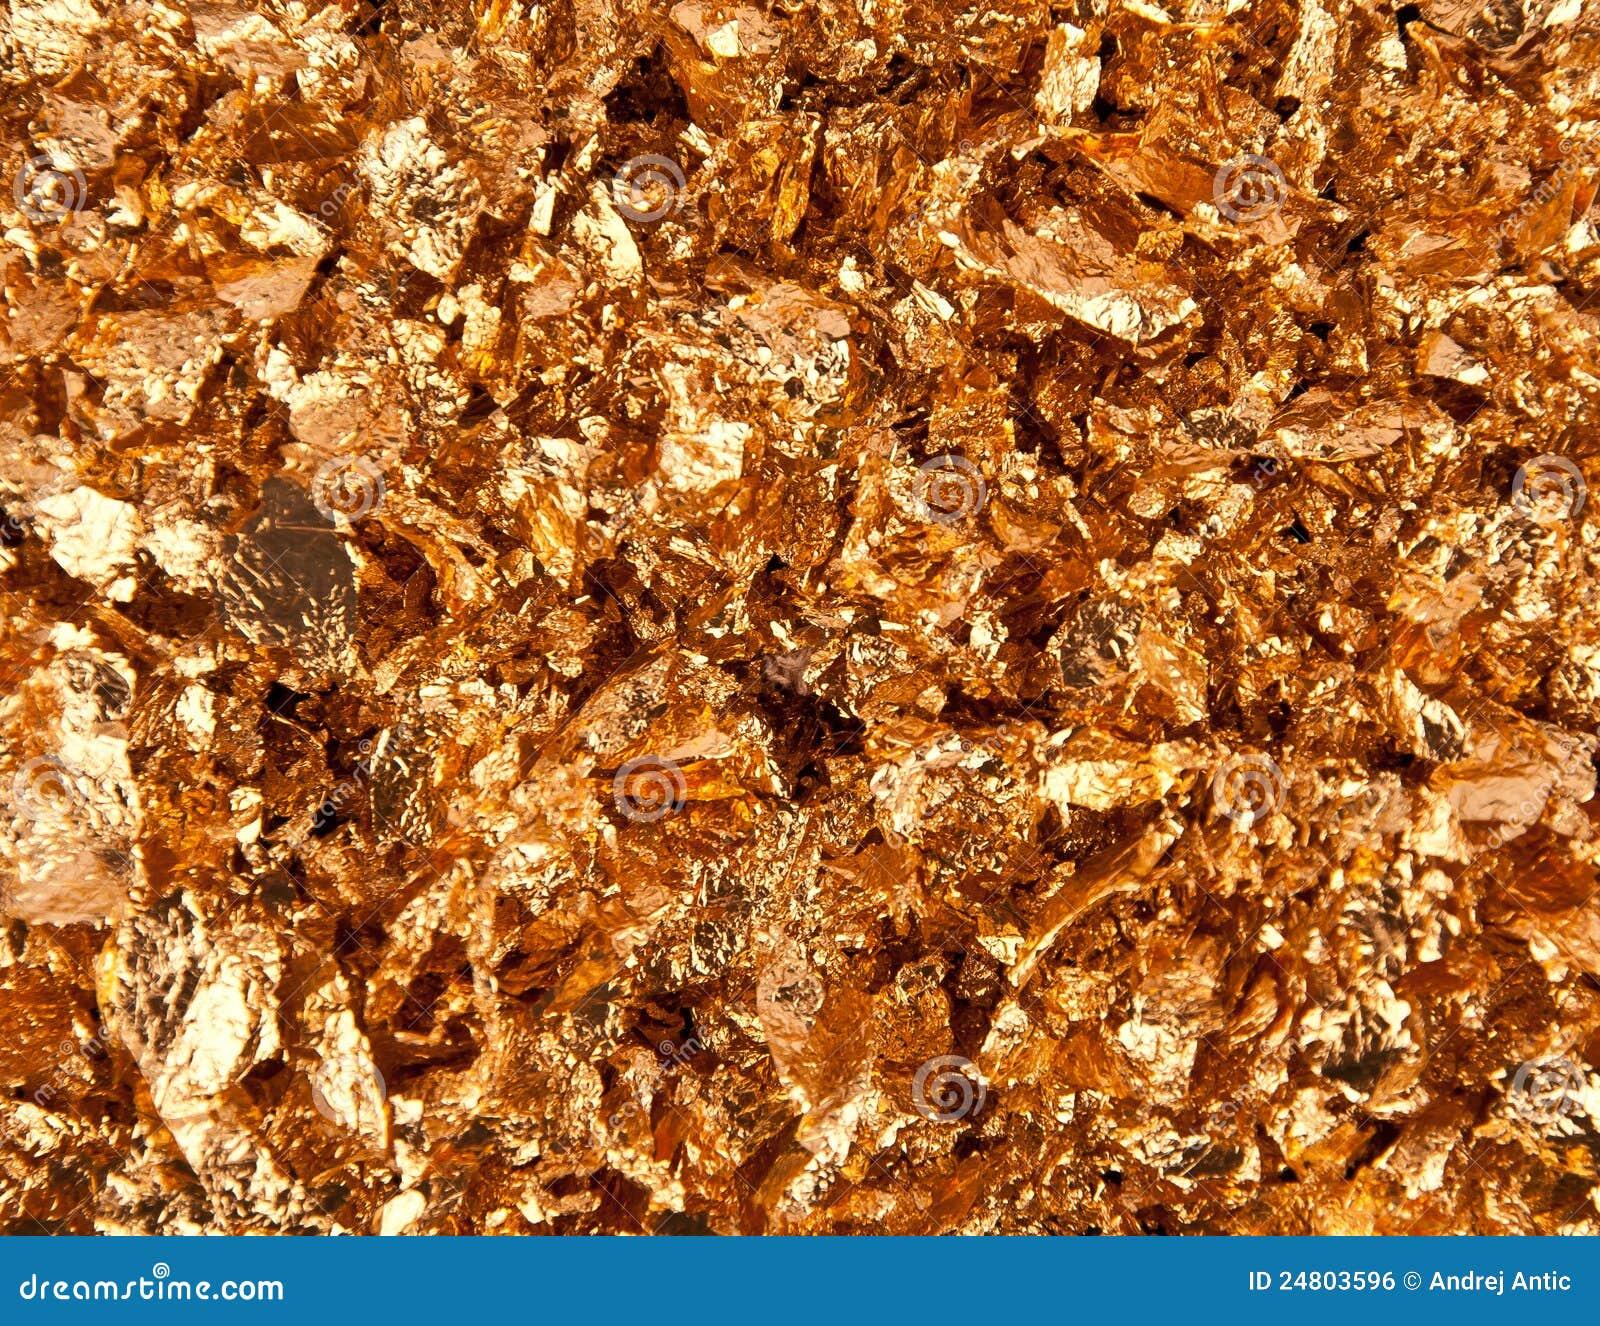 gold flakes royalty free stock image image 24803596